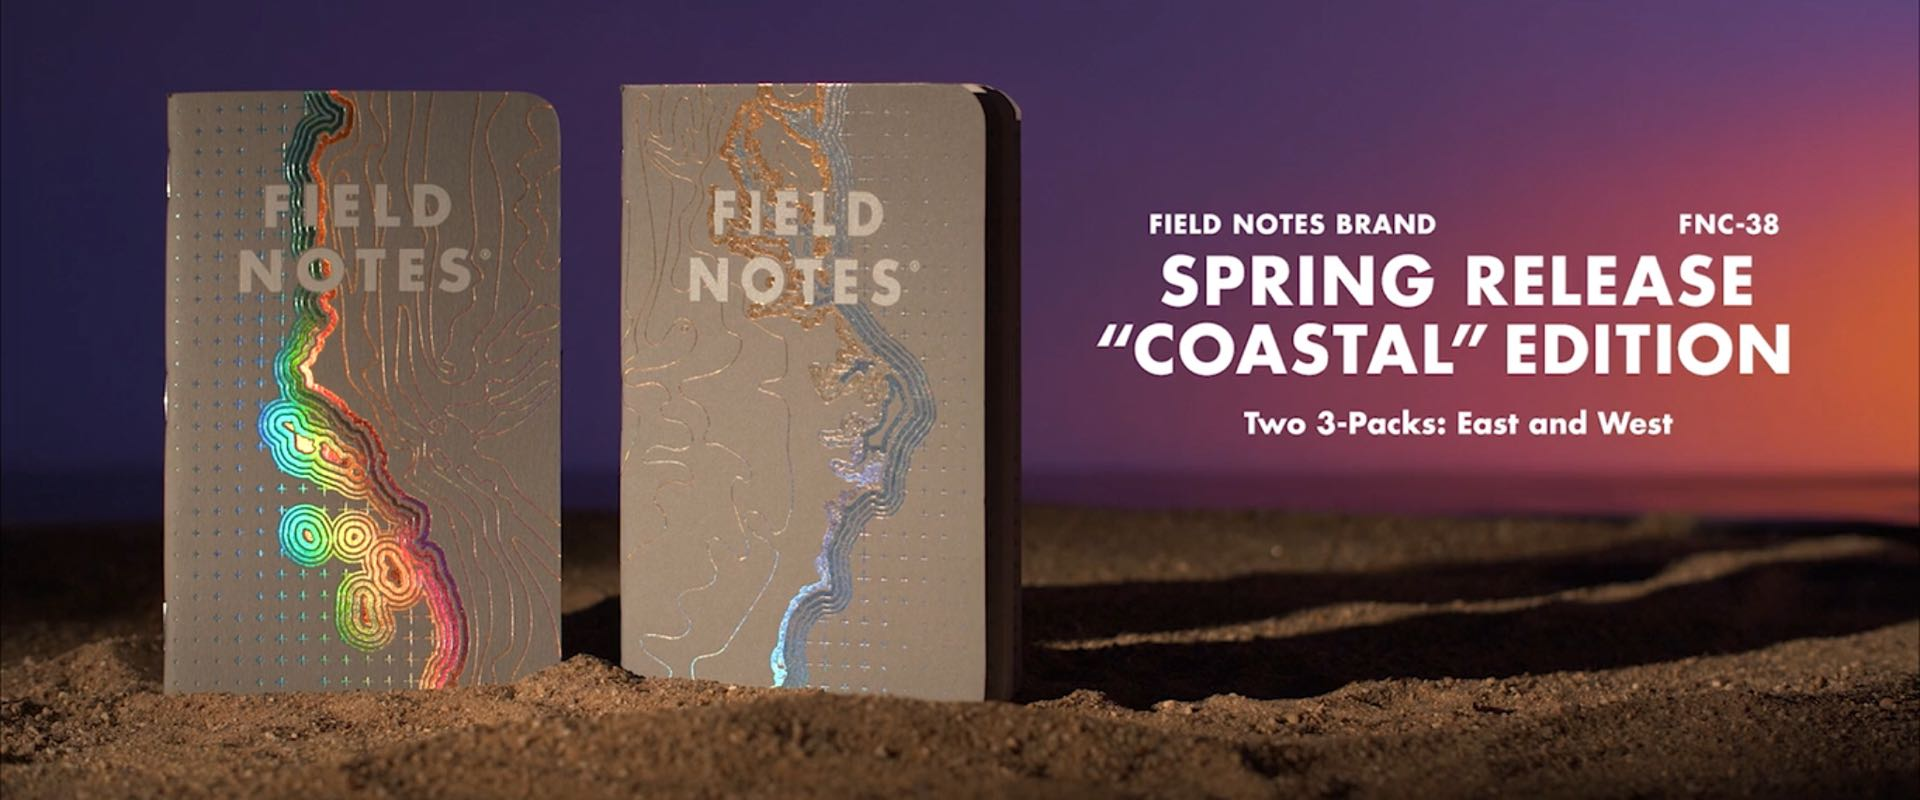 field-notes-coastal-edition